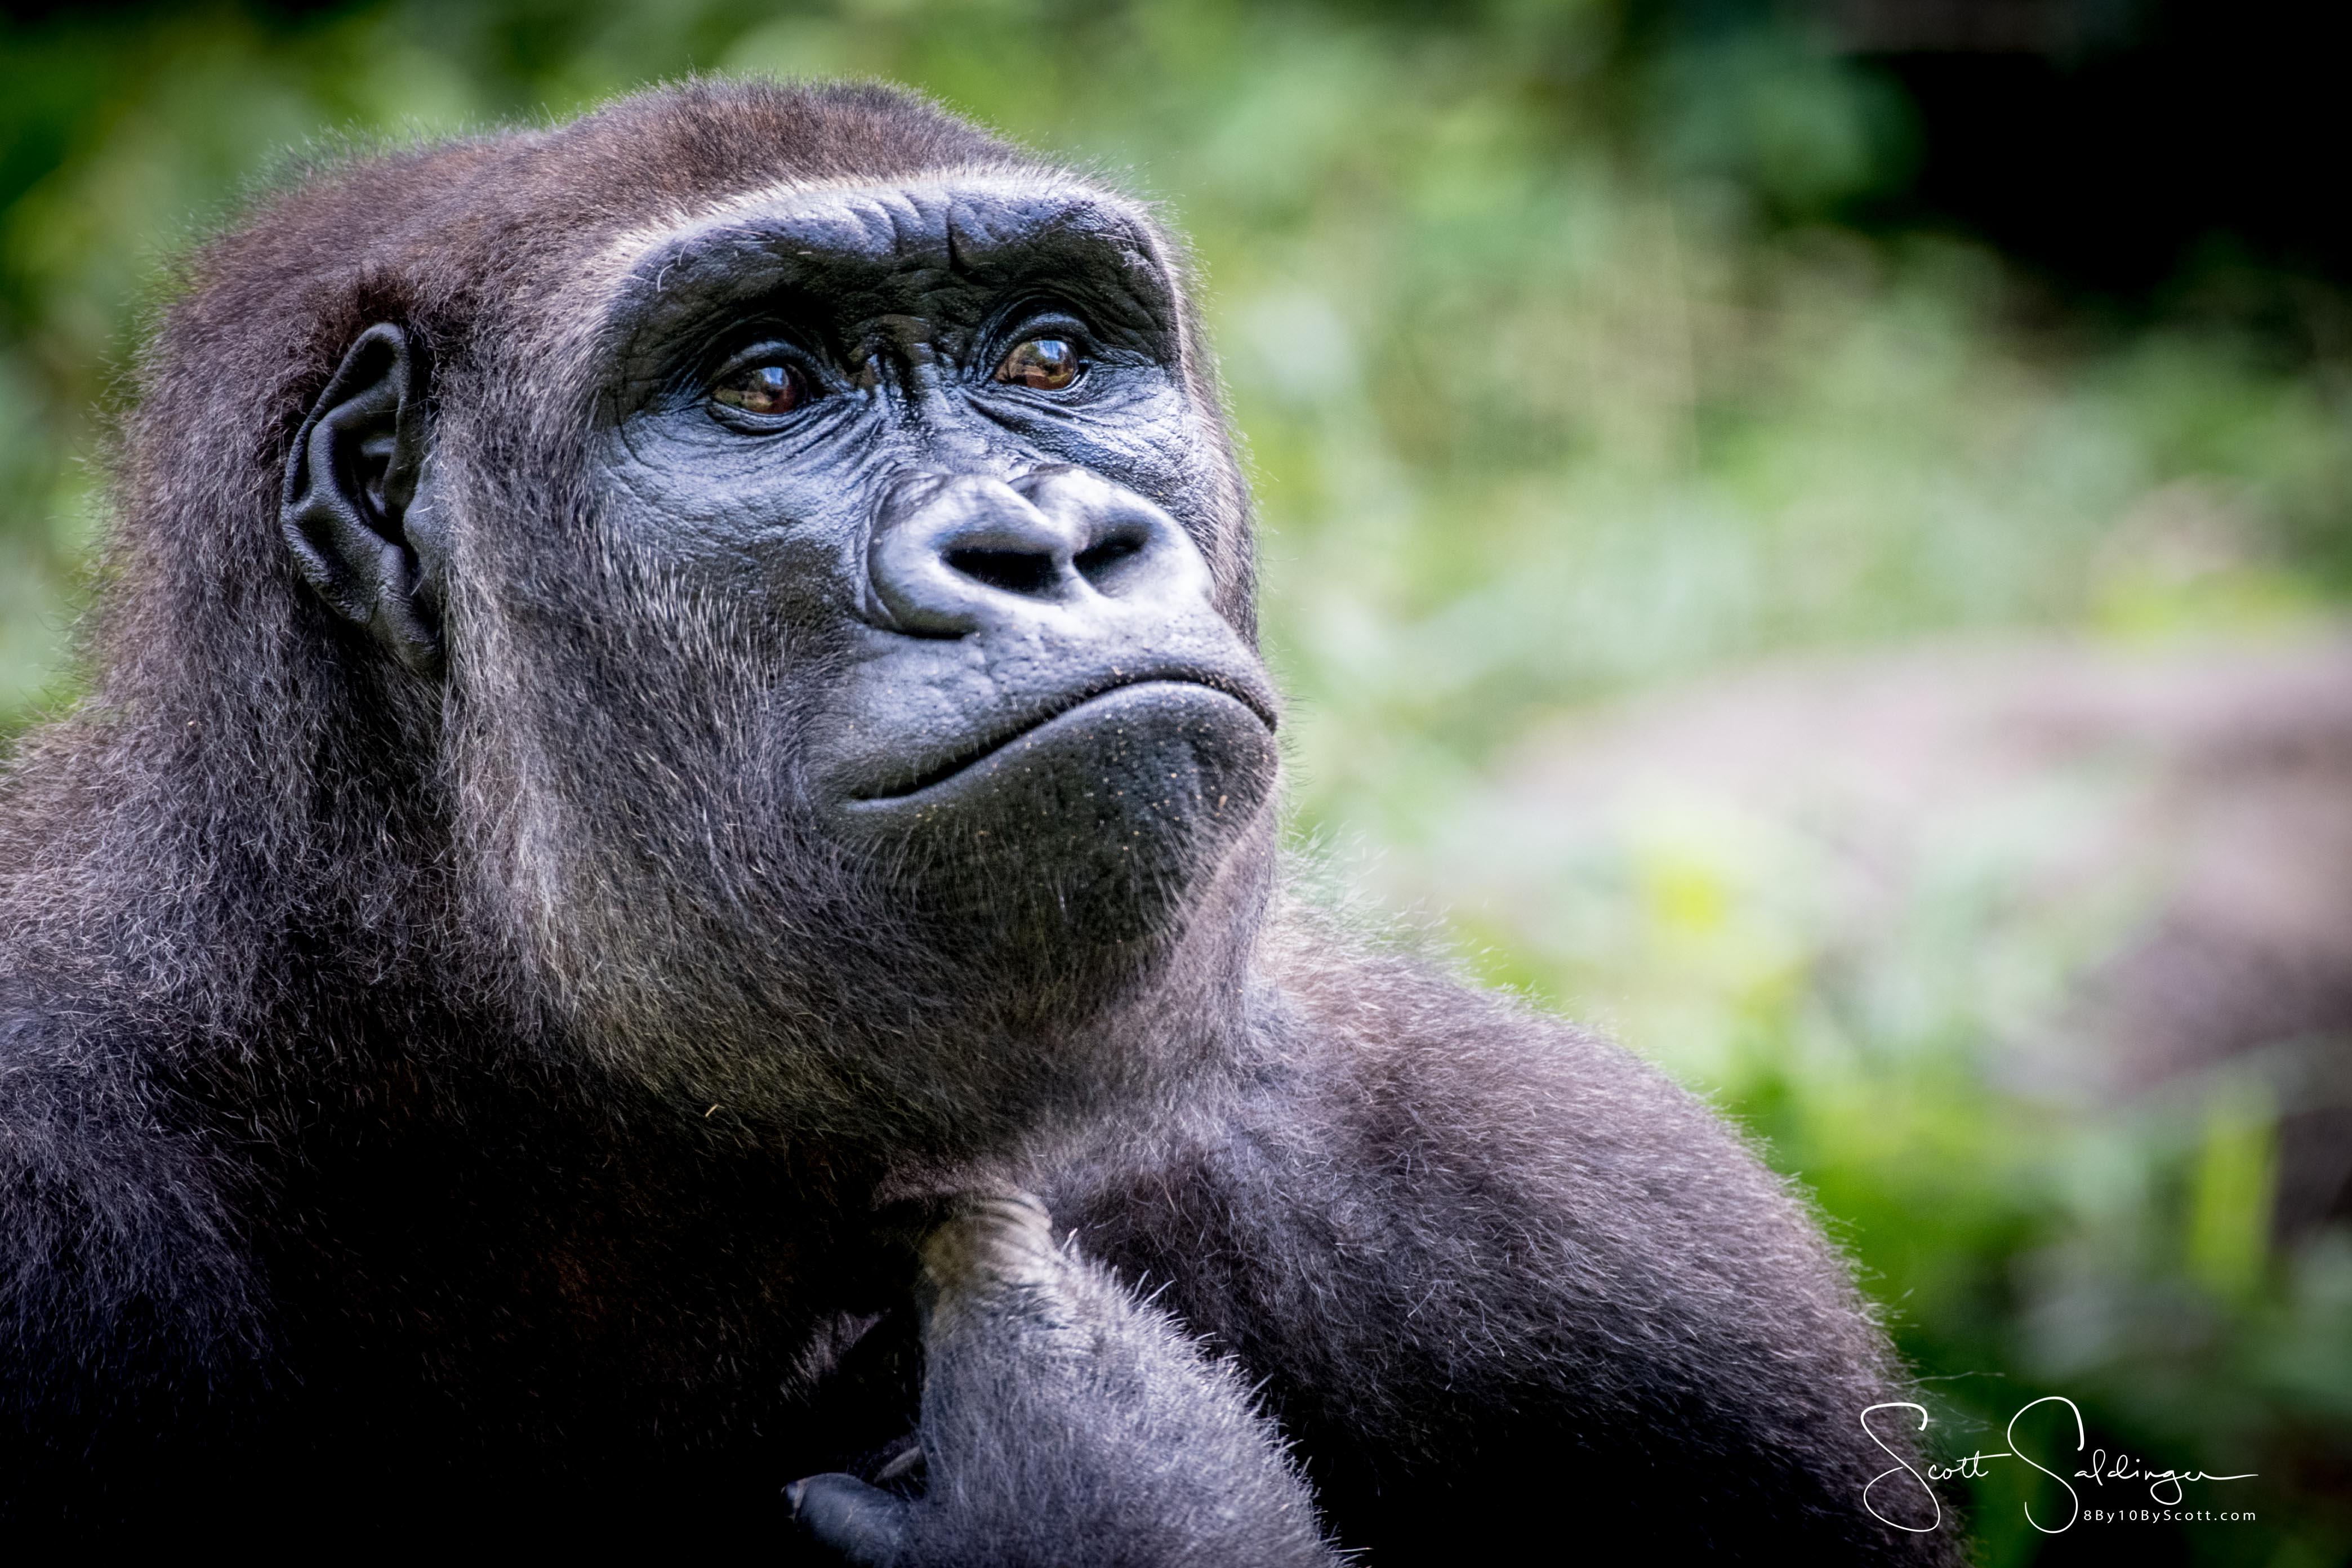 Apes-5563